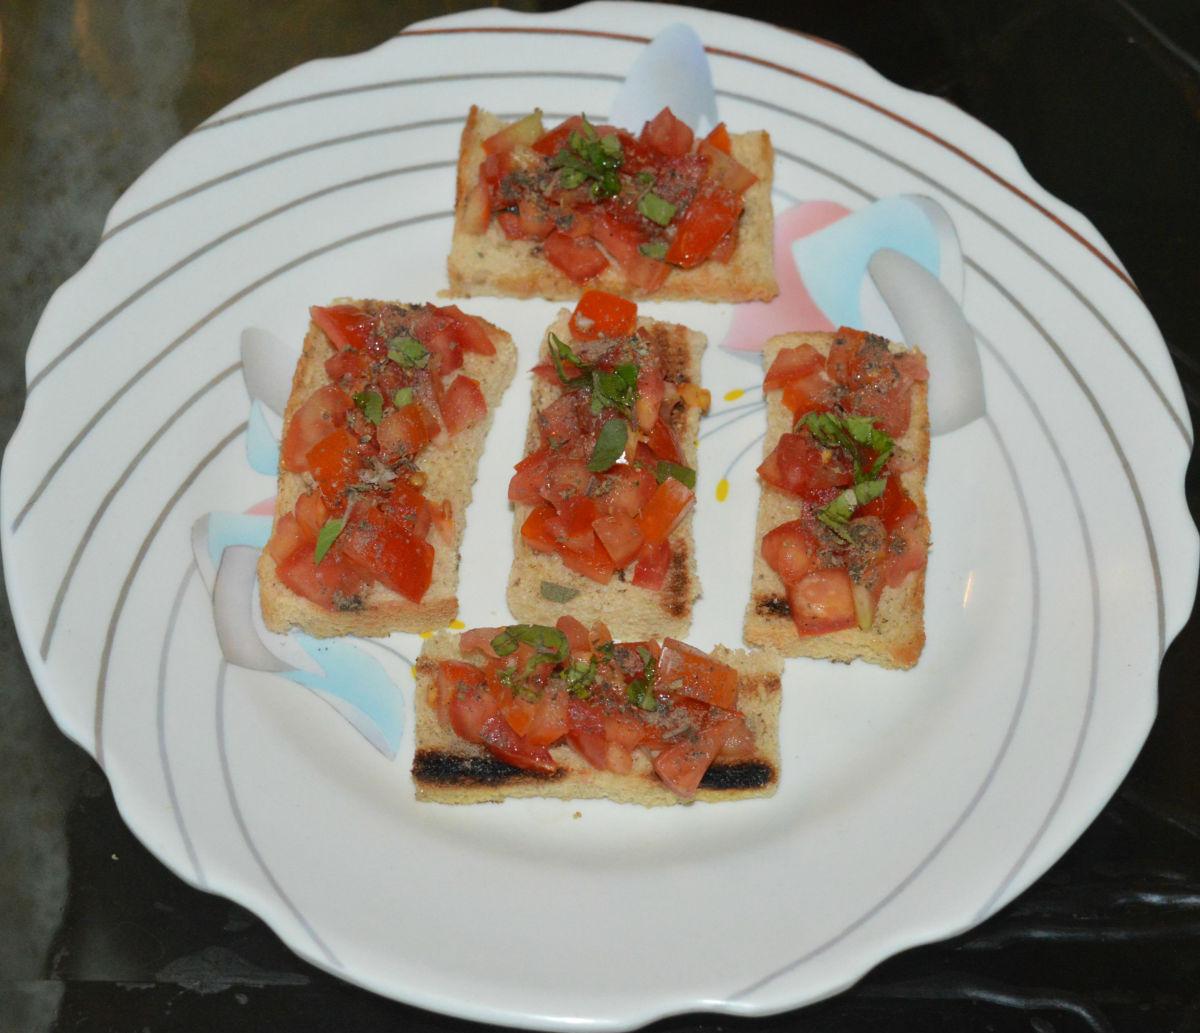 How to Make Italian Tomato Basil Bruschetta